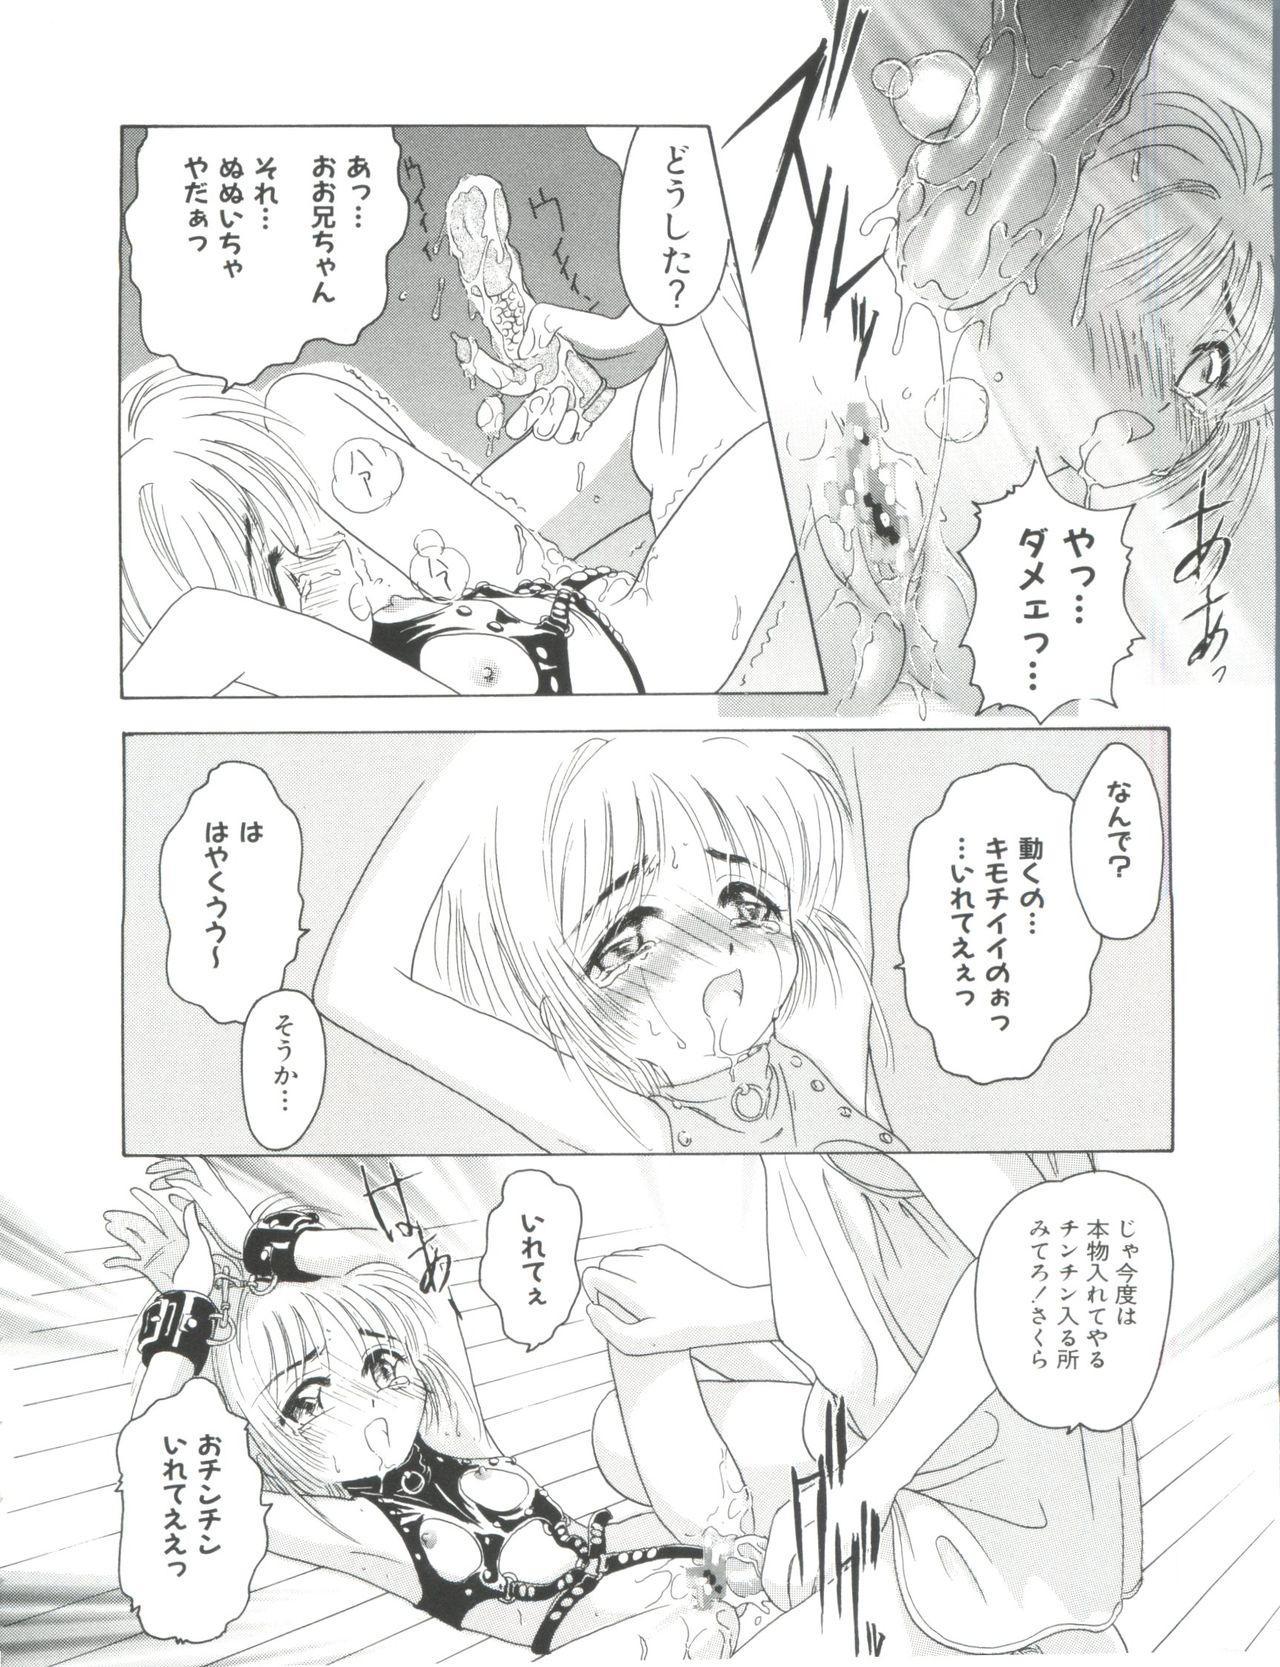 Ero-chan to Issho 79